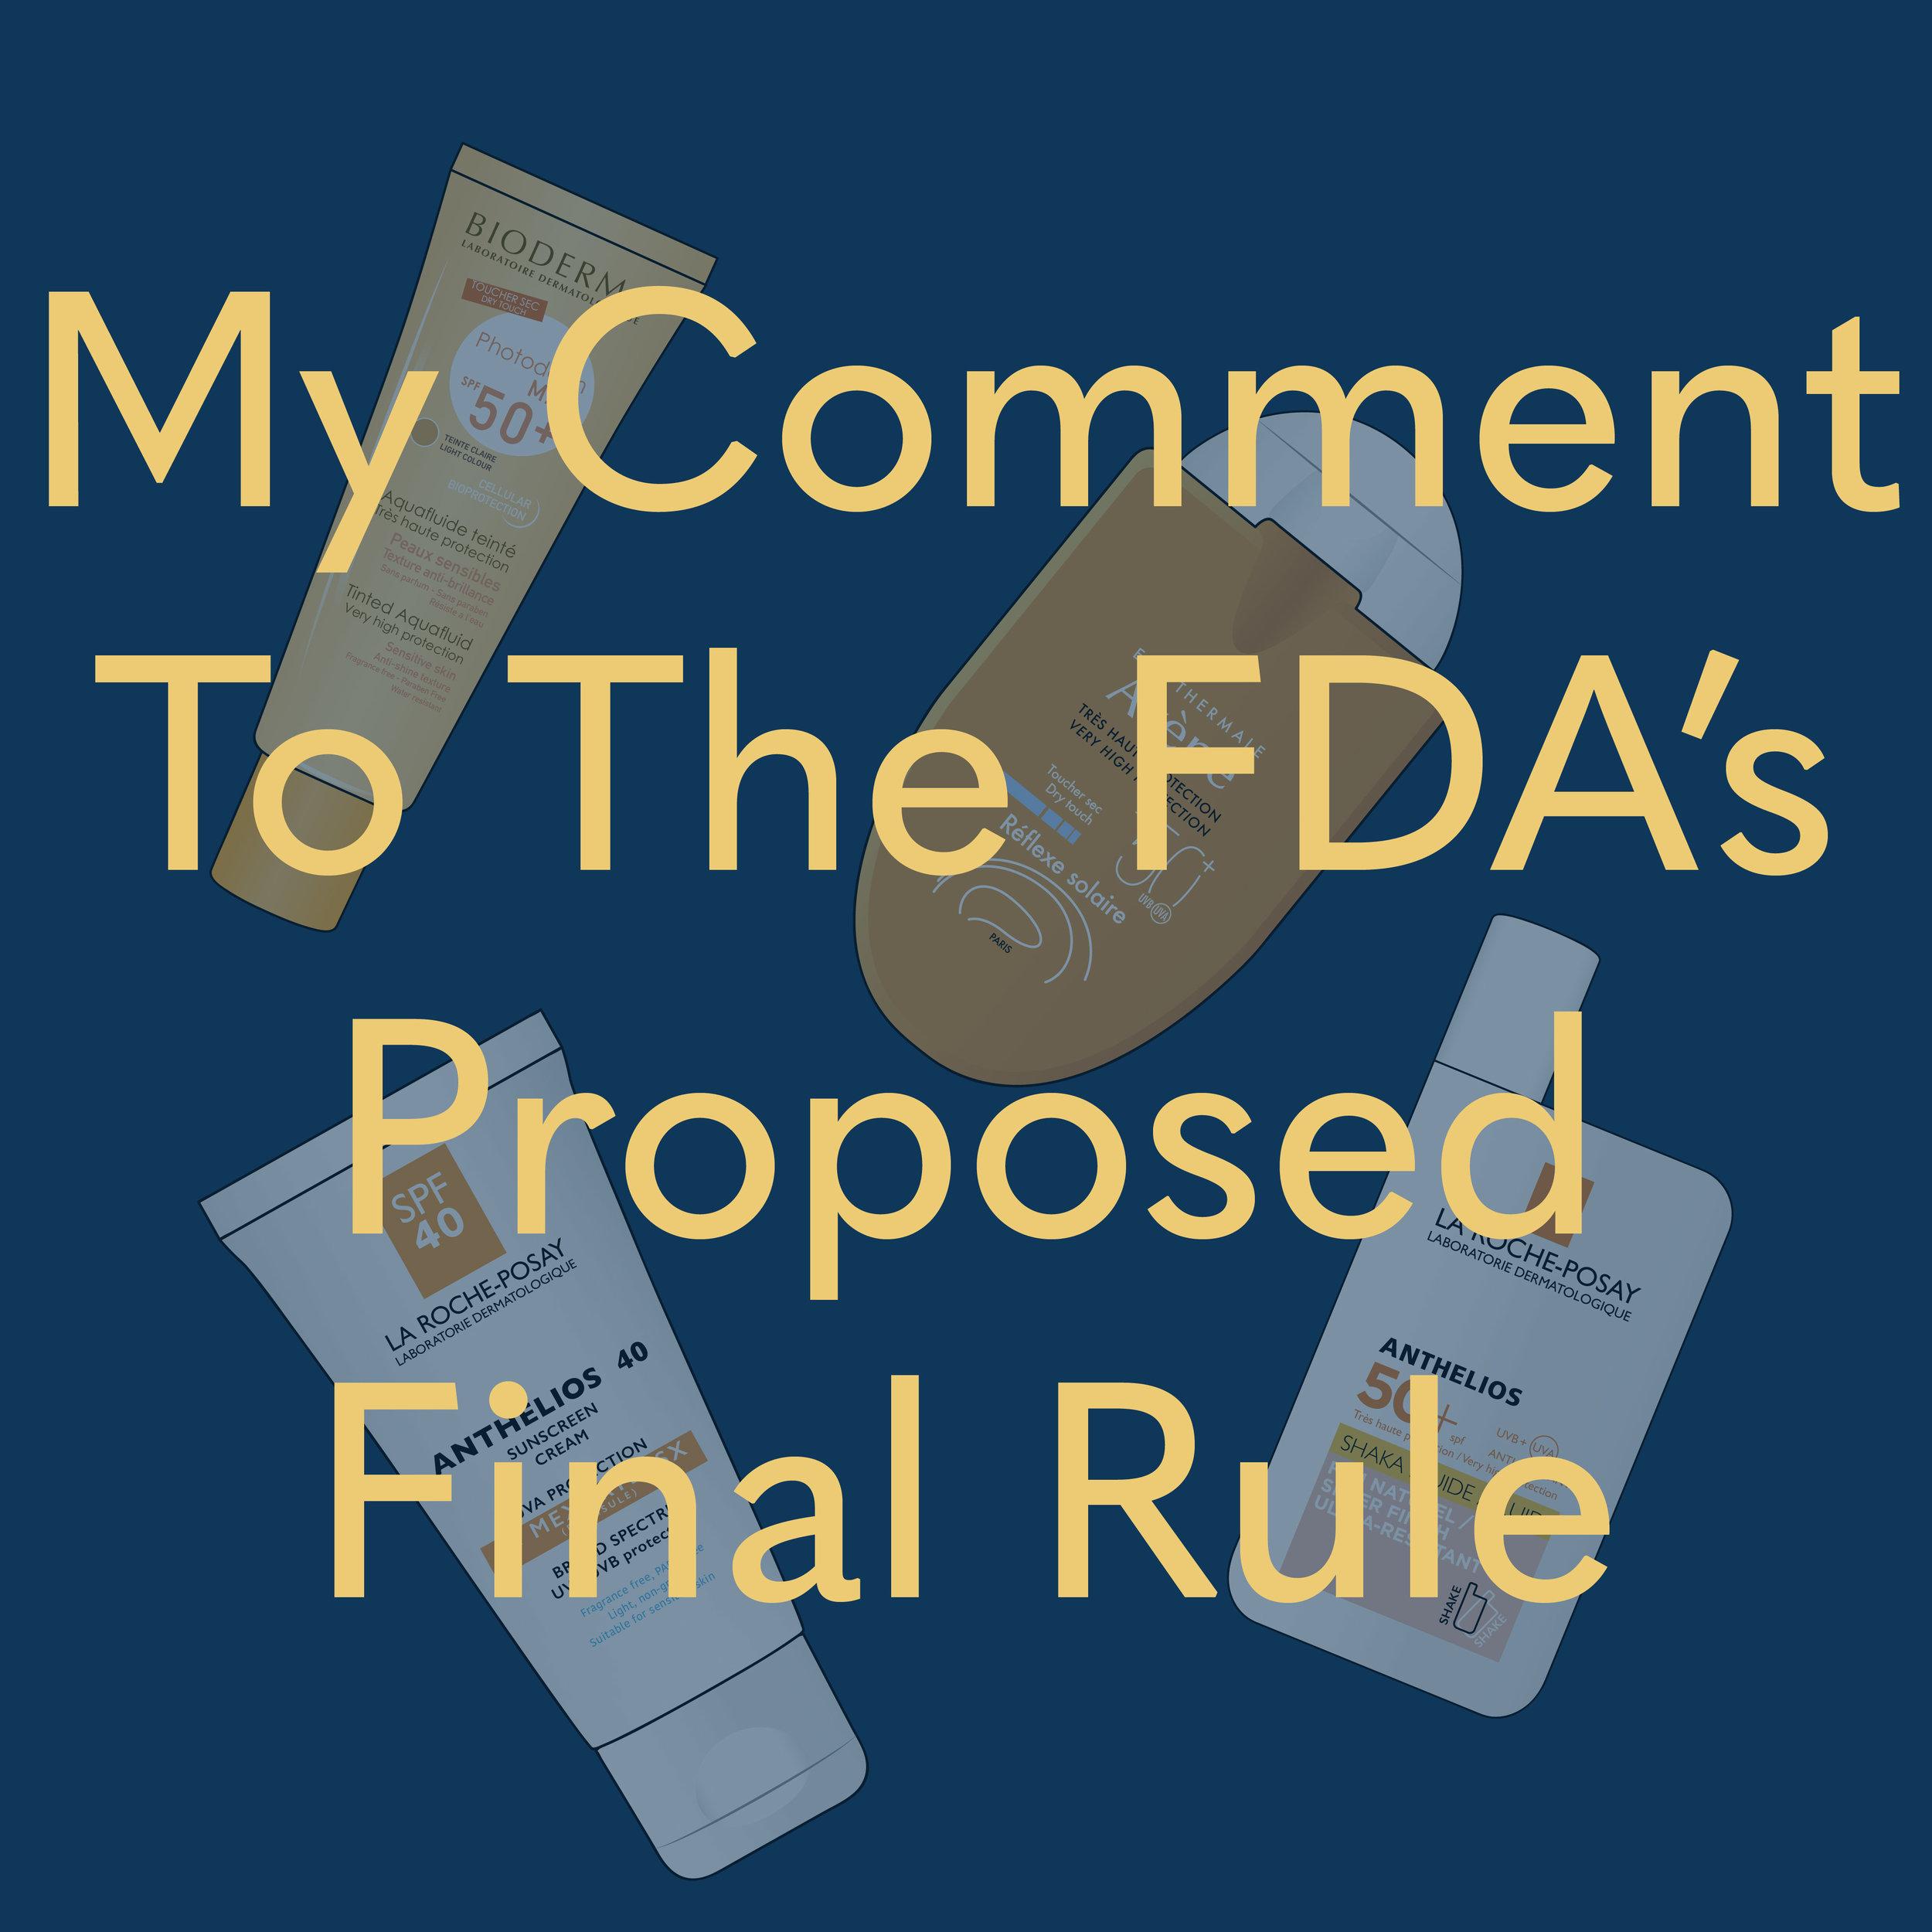 FDA Commnet.jpg